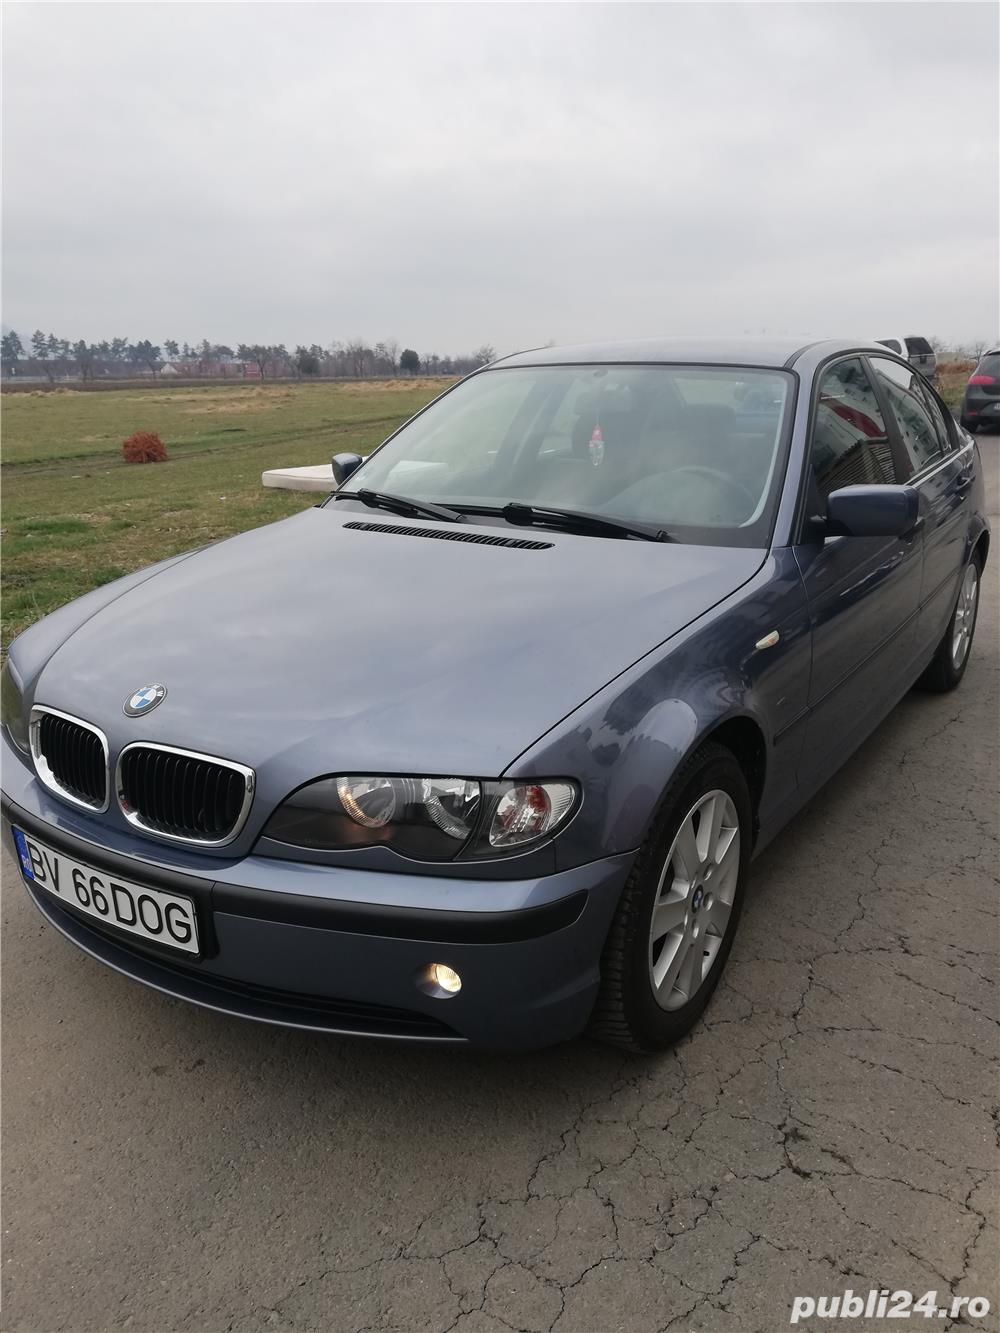 BMW 318I BENZINA 143CP EURO4.Inmatriculat Ro.